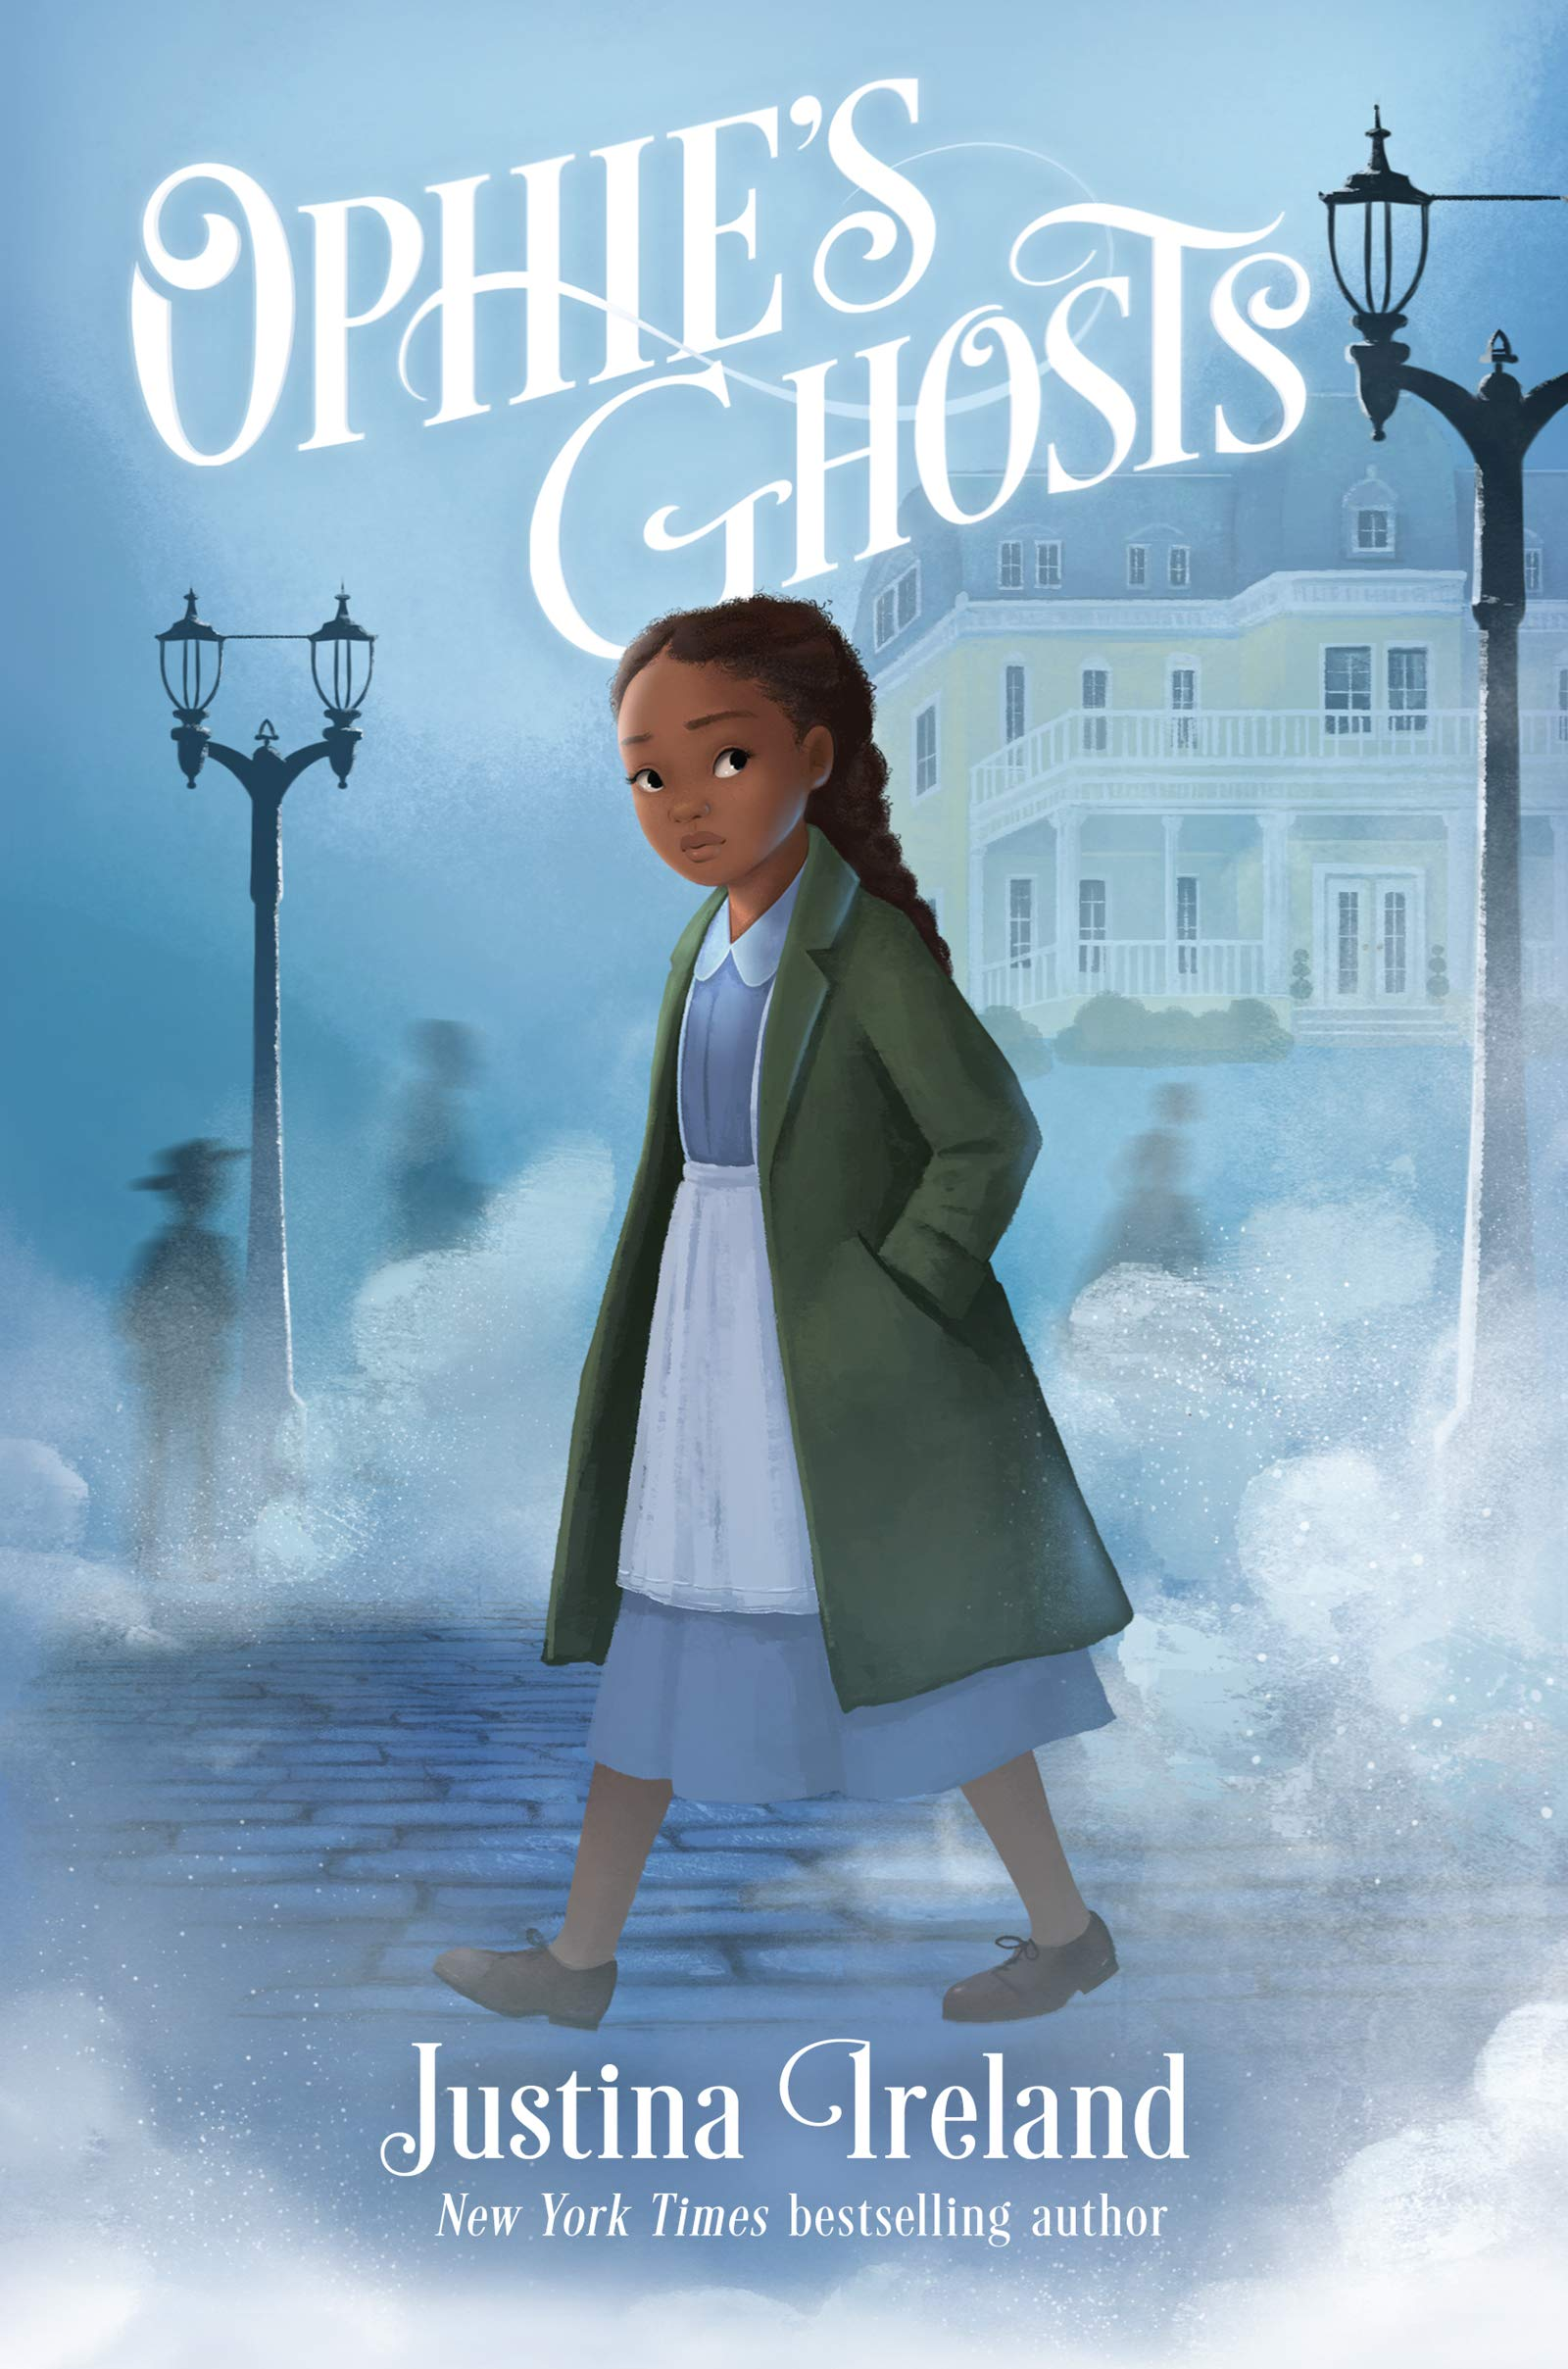 Ophie's Ghosts: Ireland, Justina: 9780062915894: Books - Amazon.ca